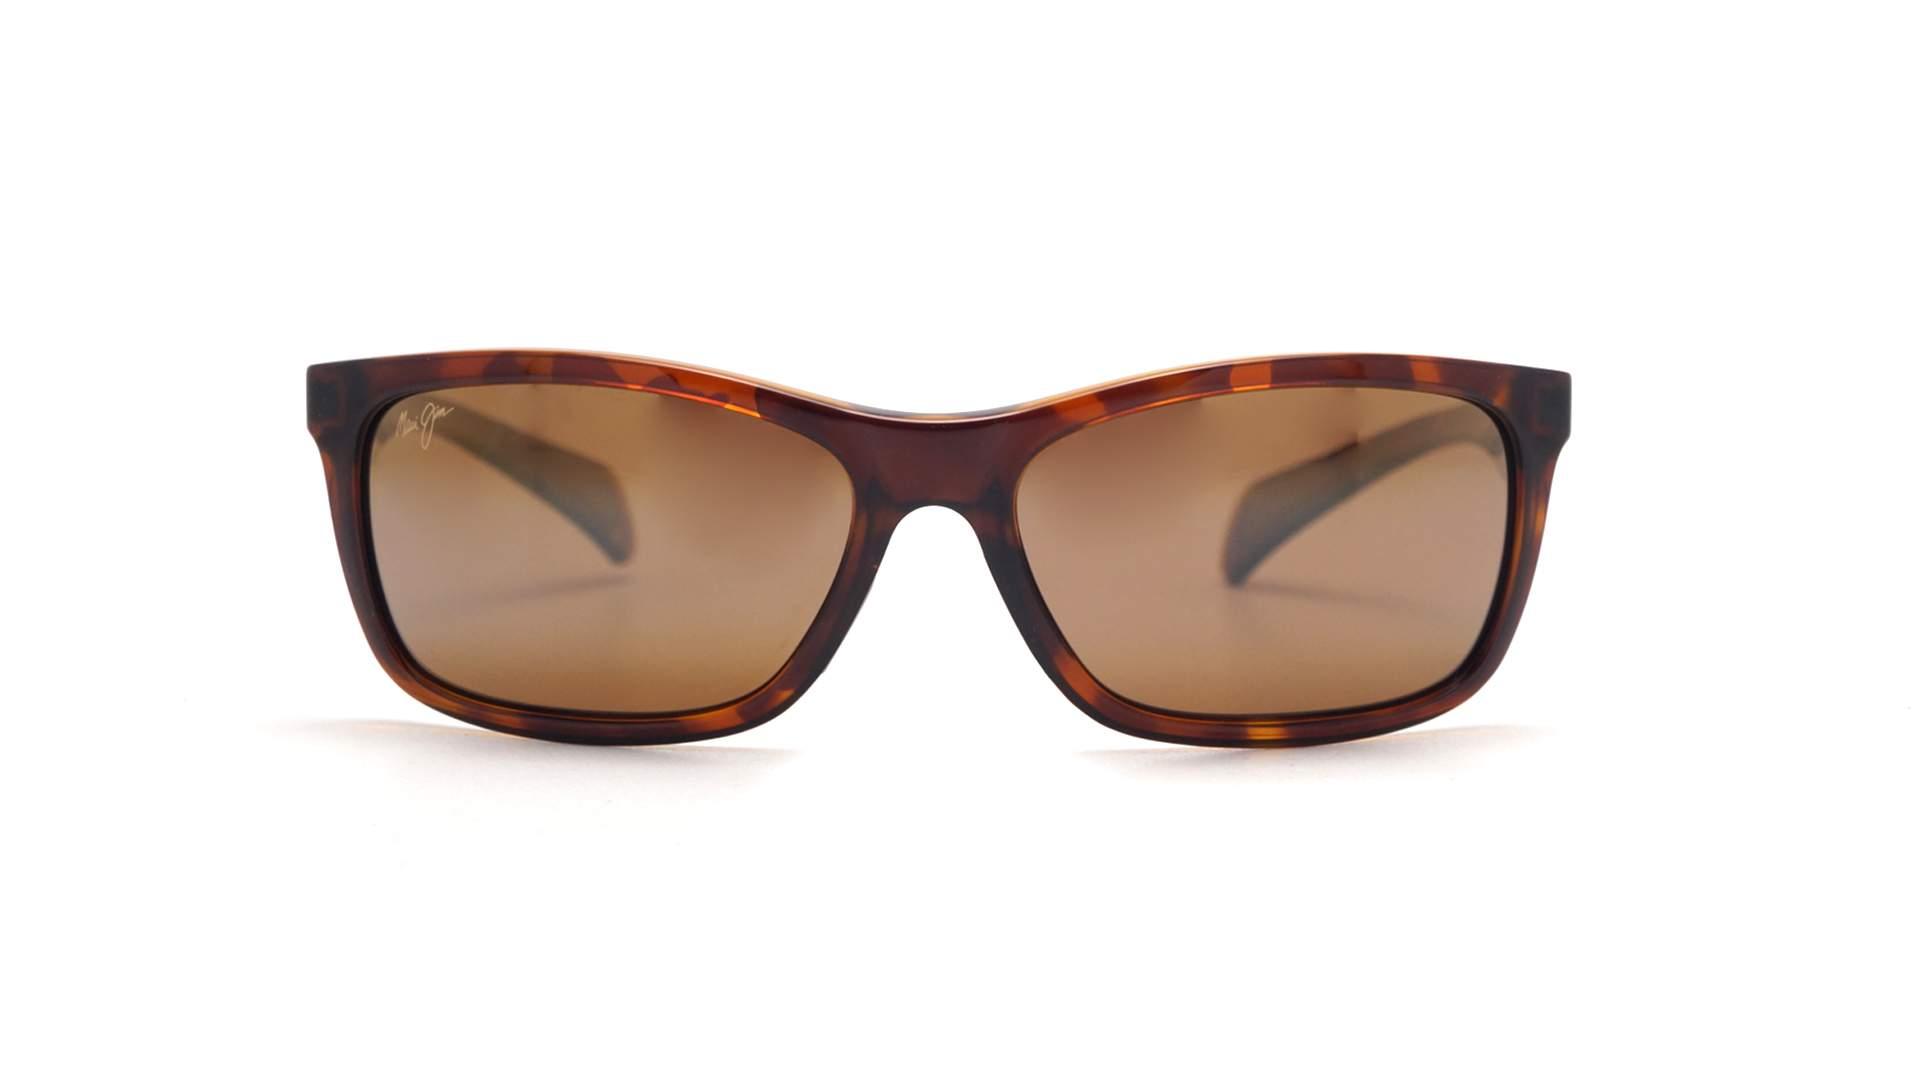 280c27e881c Sunglasses Maui Jim Puhi Tortoise Minéral superthin H785-10 59-17 Medium  Polarized Gradient Flash